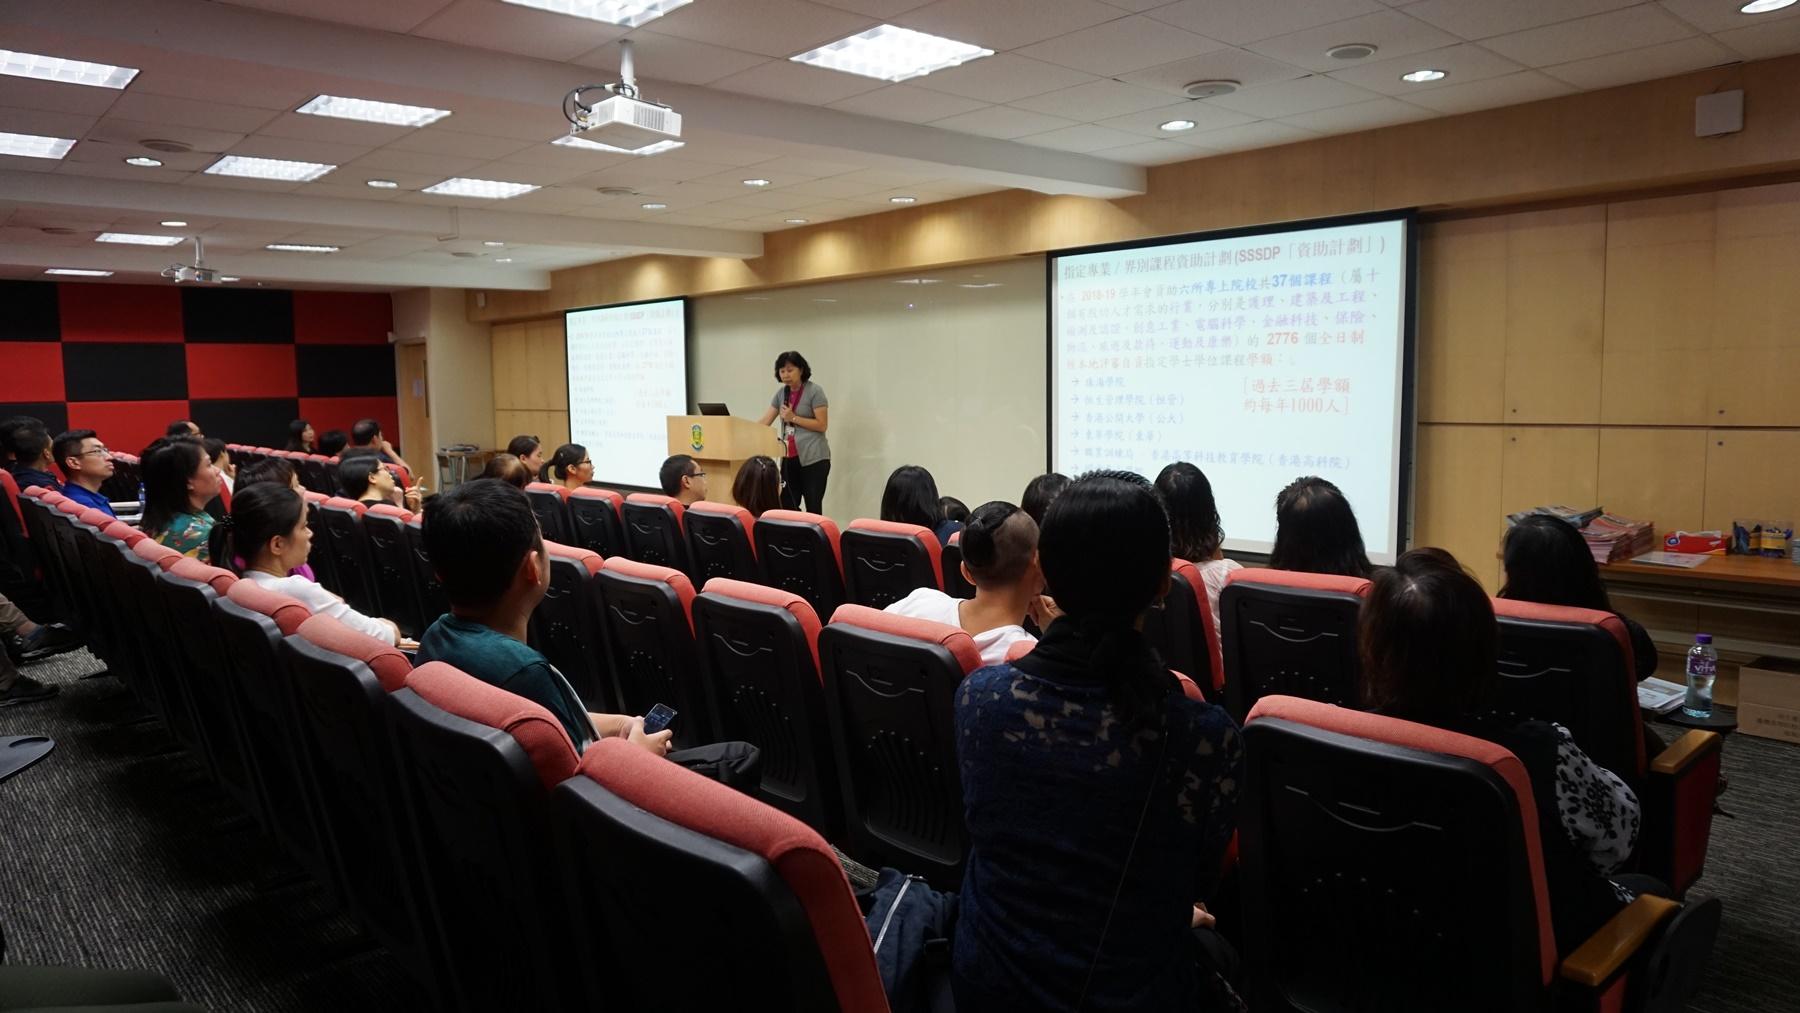 http://npc.edu.hk/sites/default/files/dsc02947.jpg